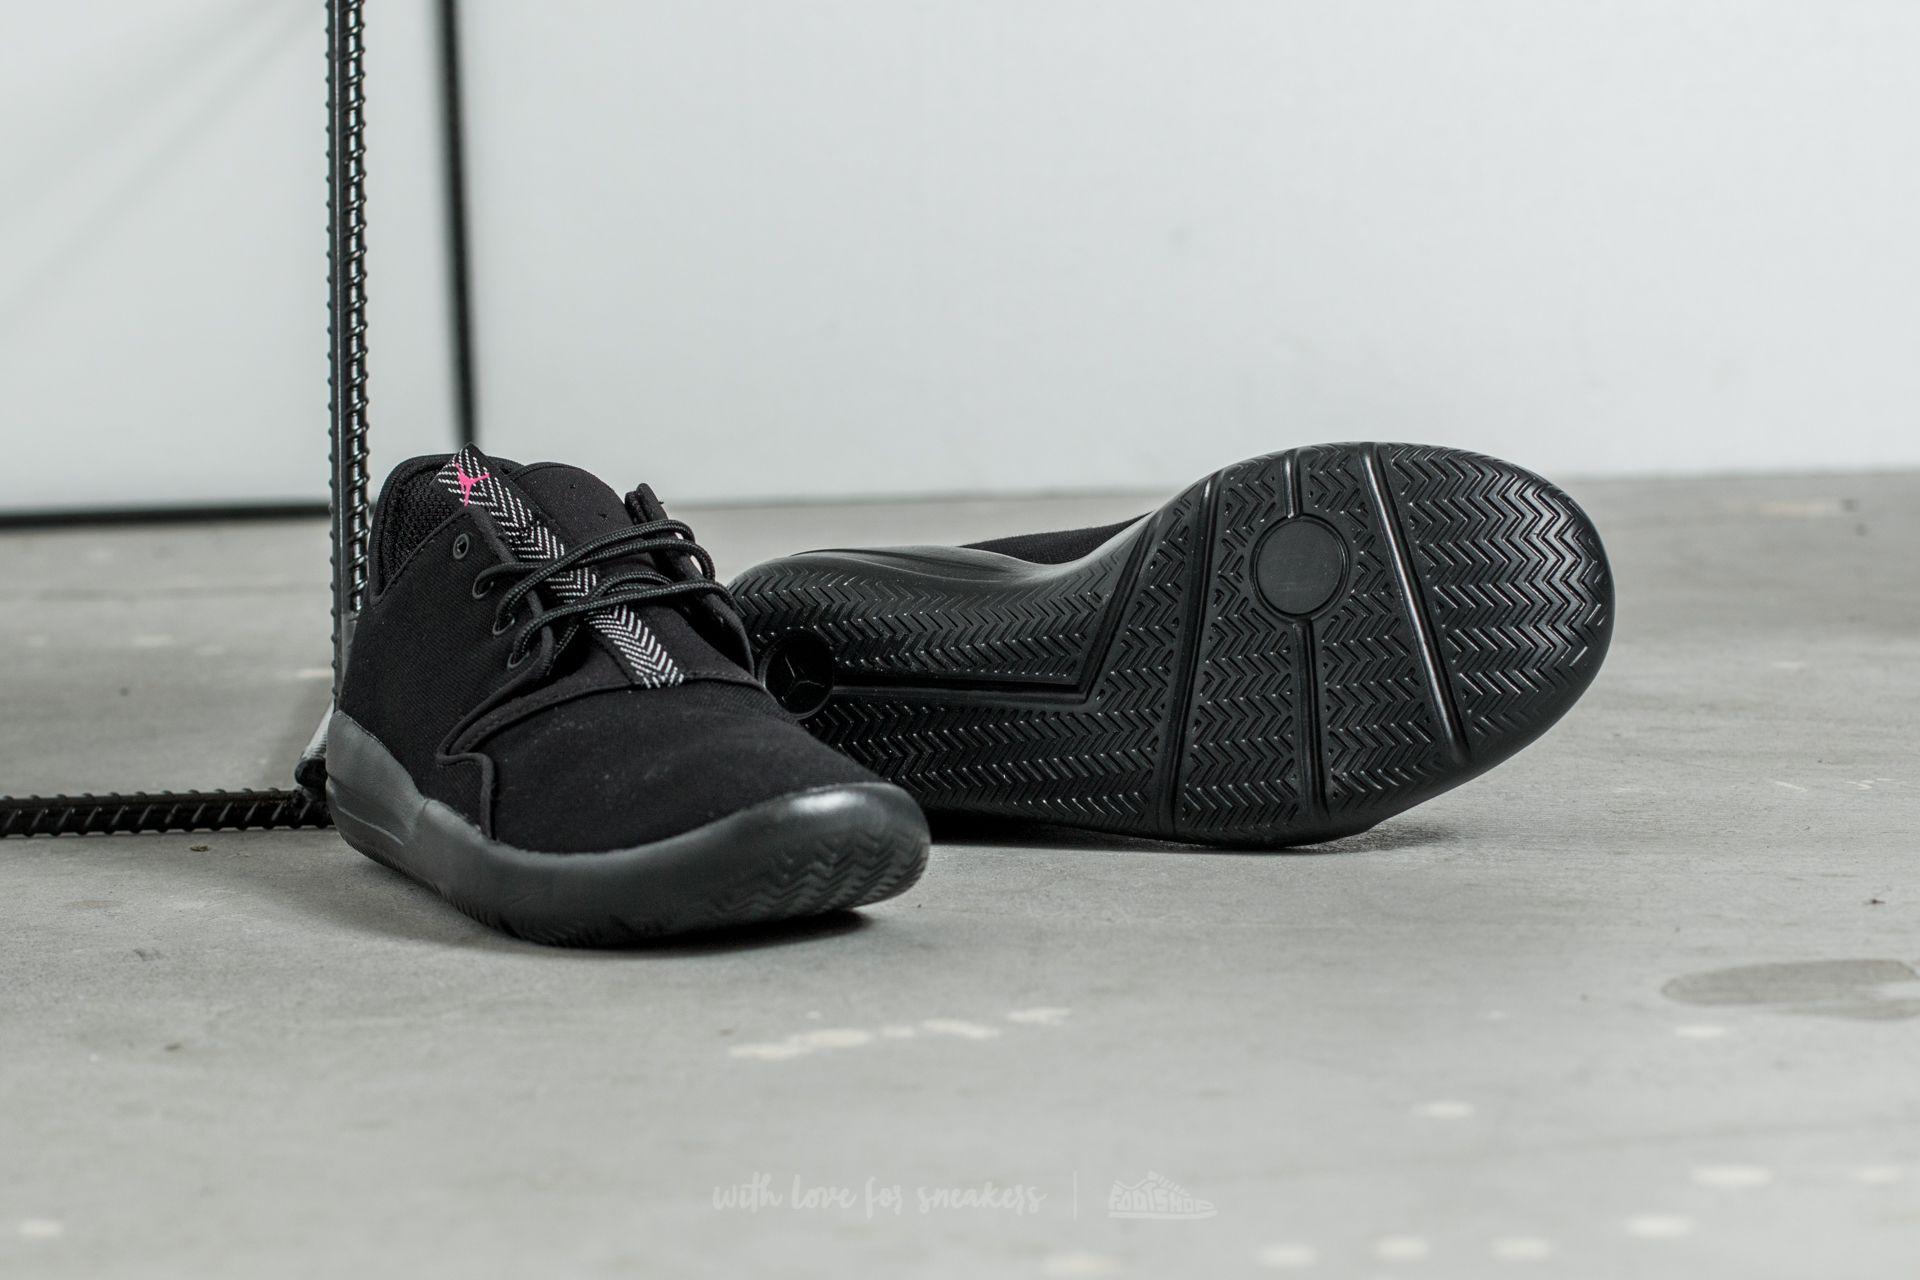 Nike Air Jordan Eclipse GG (BlackHyper Pink)